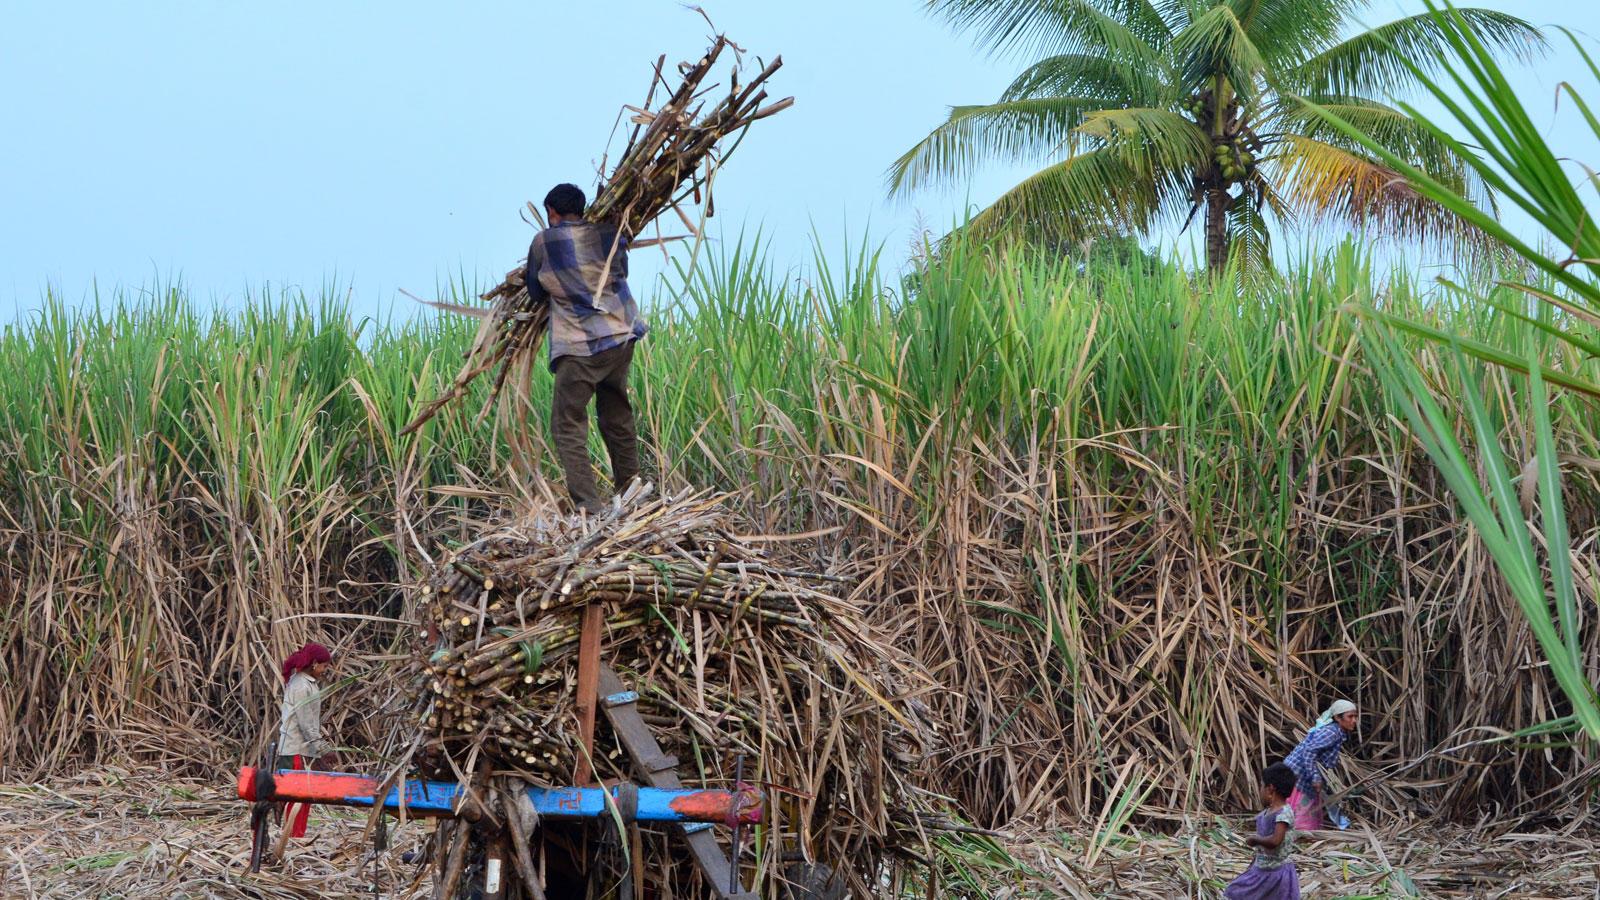 Farmers busy with harvesting sugarcane in western Maharashtra (Photo: Rahul Gayakwad)